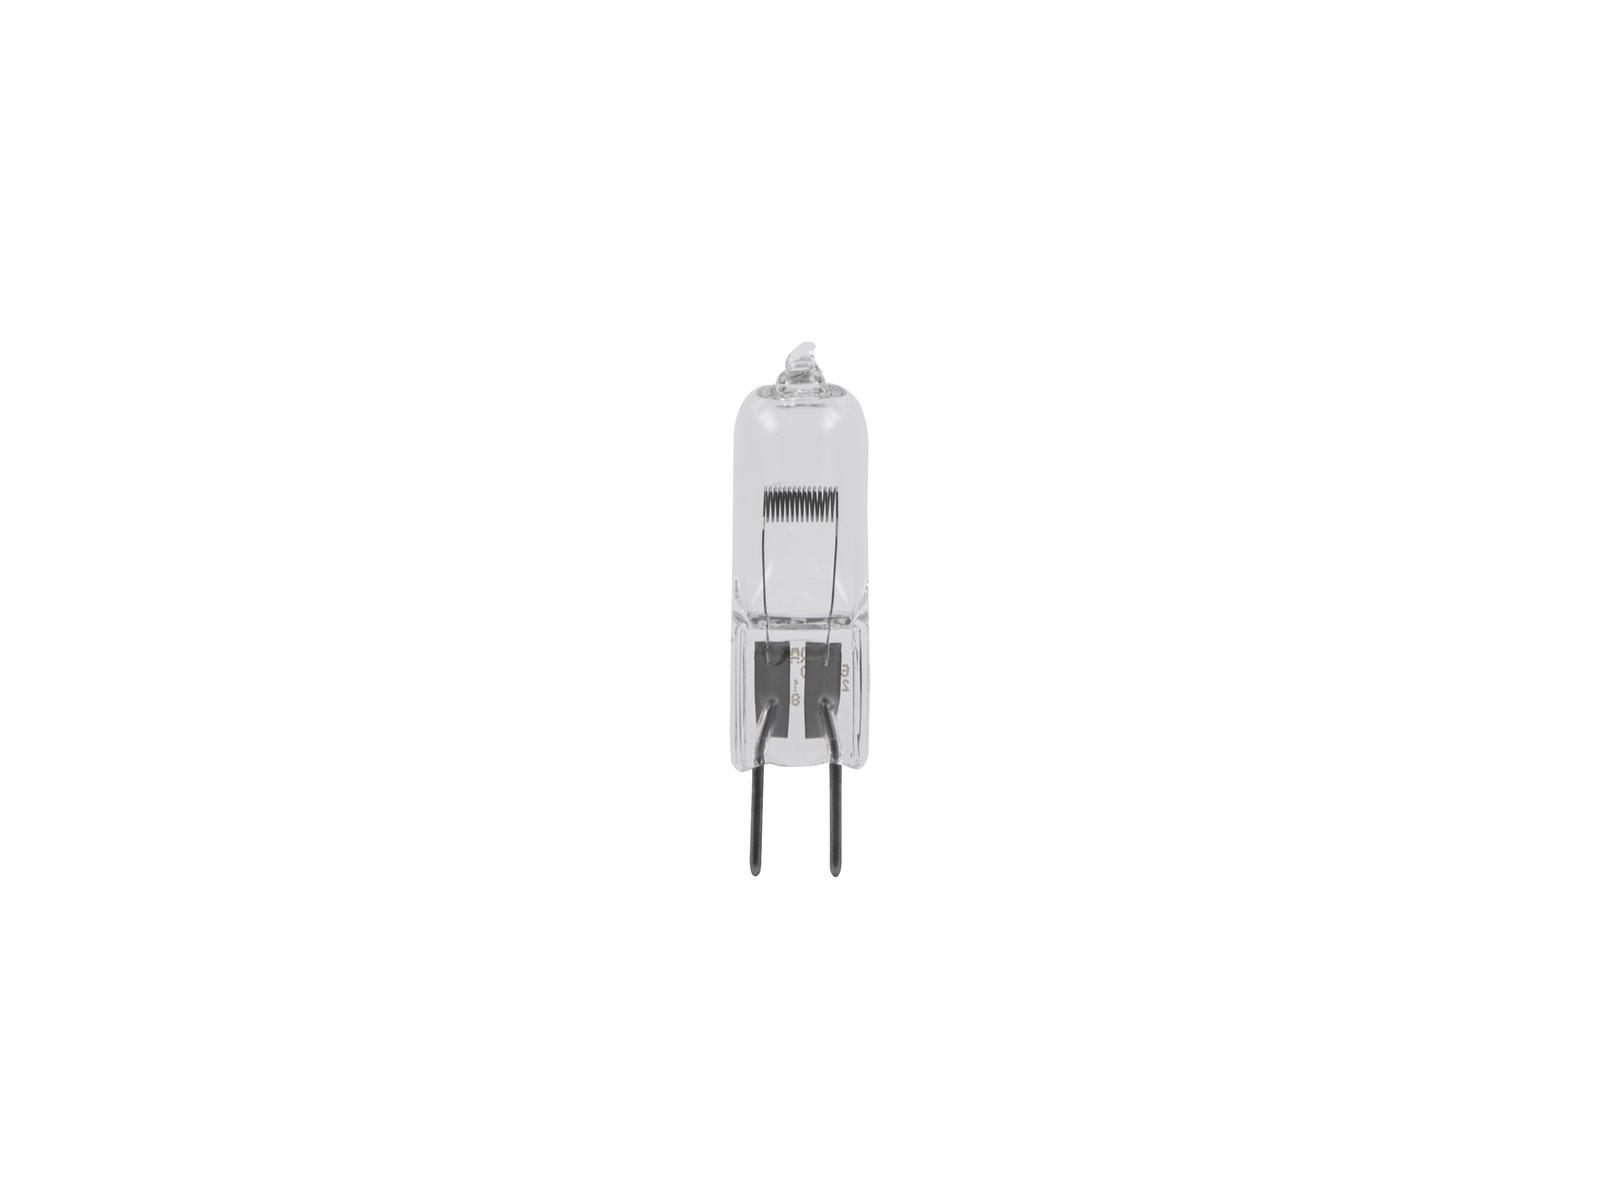 24V/150W G 6,35 HLX64640 FCS A1/216 Osram, sv. zdroj